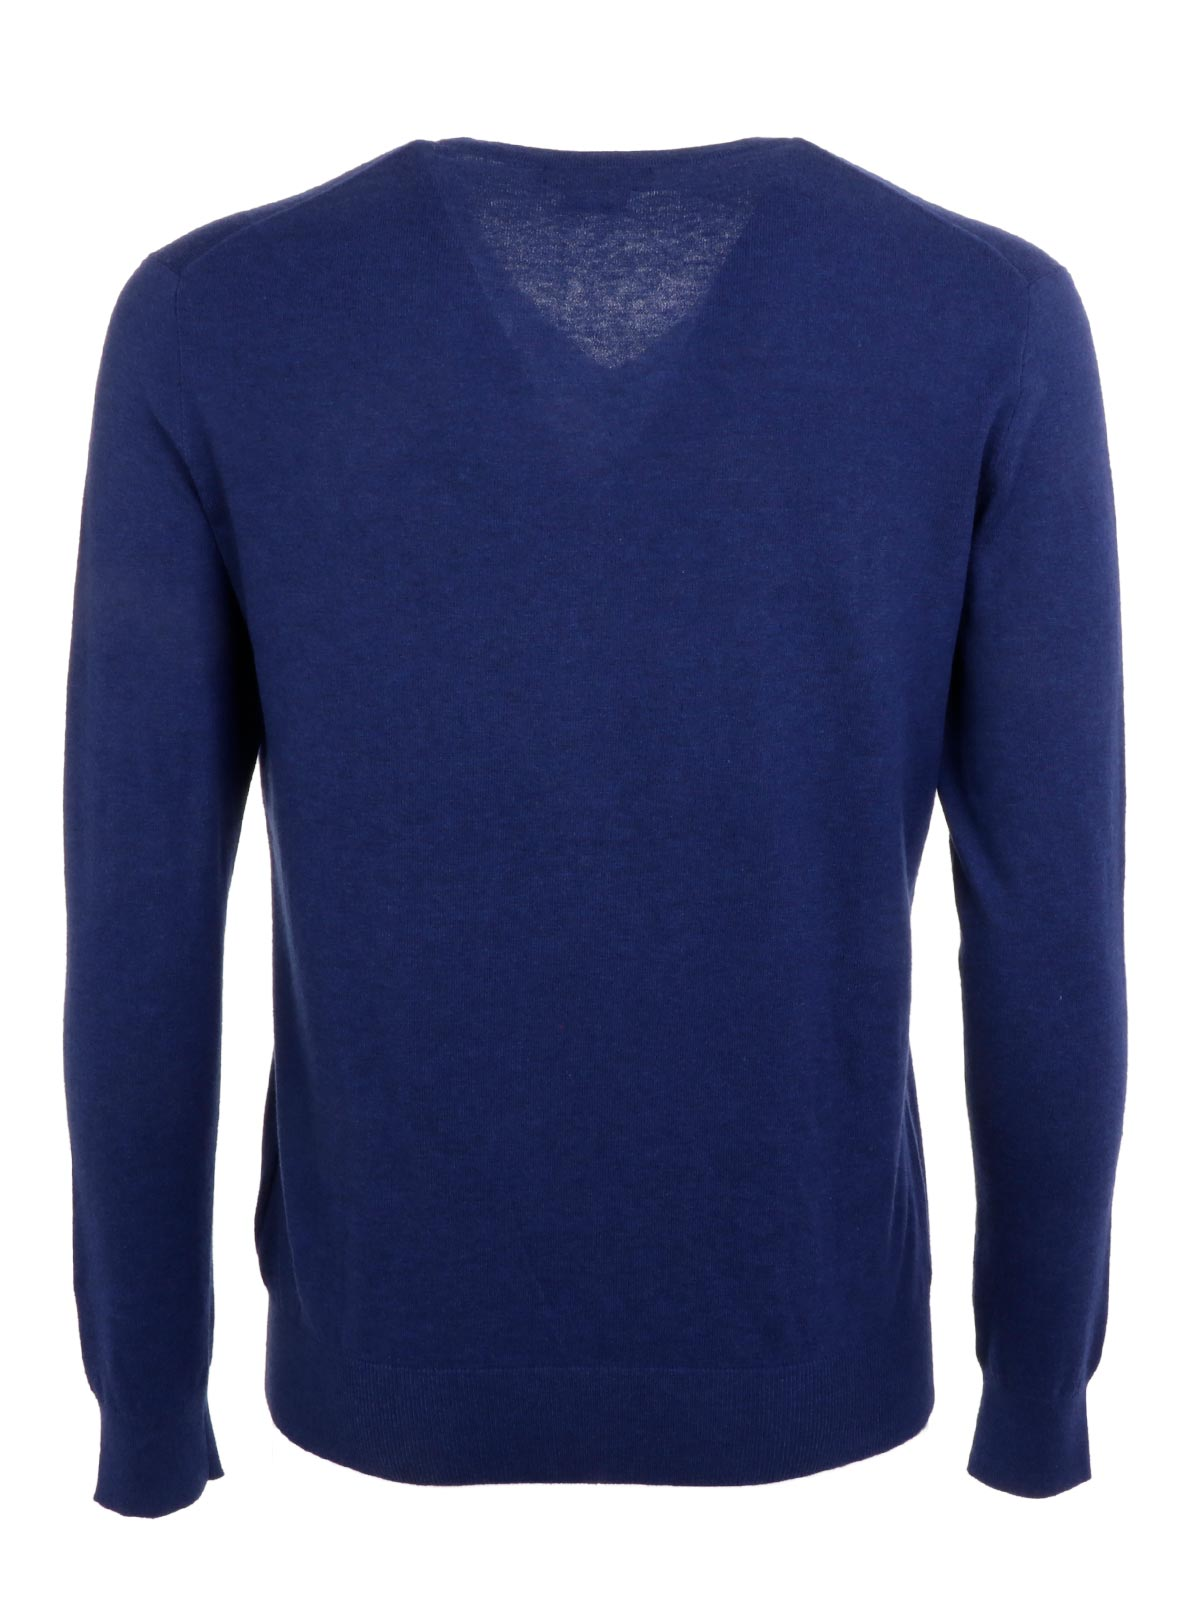 Picture of POLO RALPH LAUREN | Men's Cotton Blend Sweater